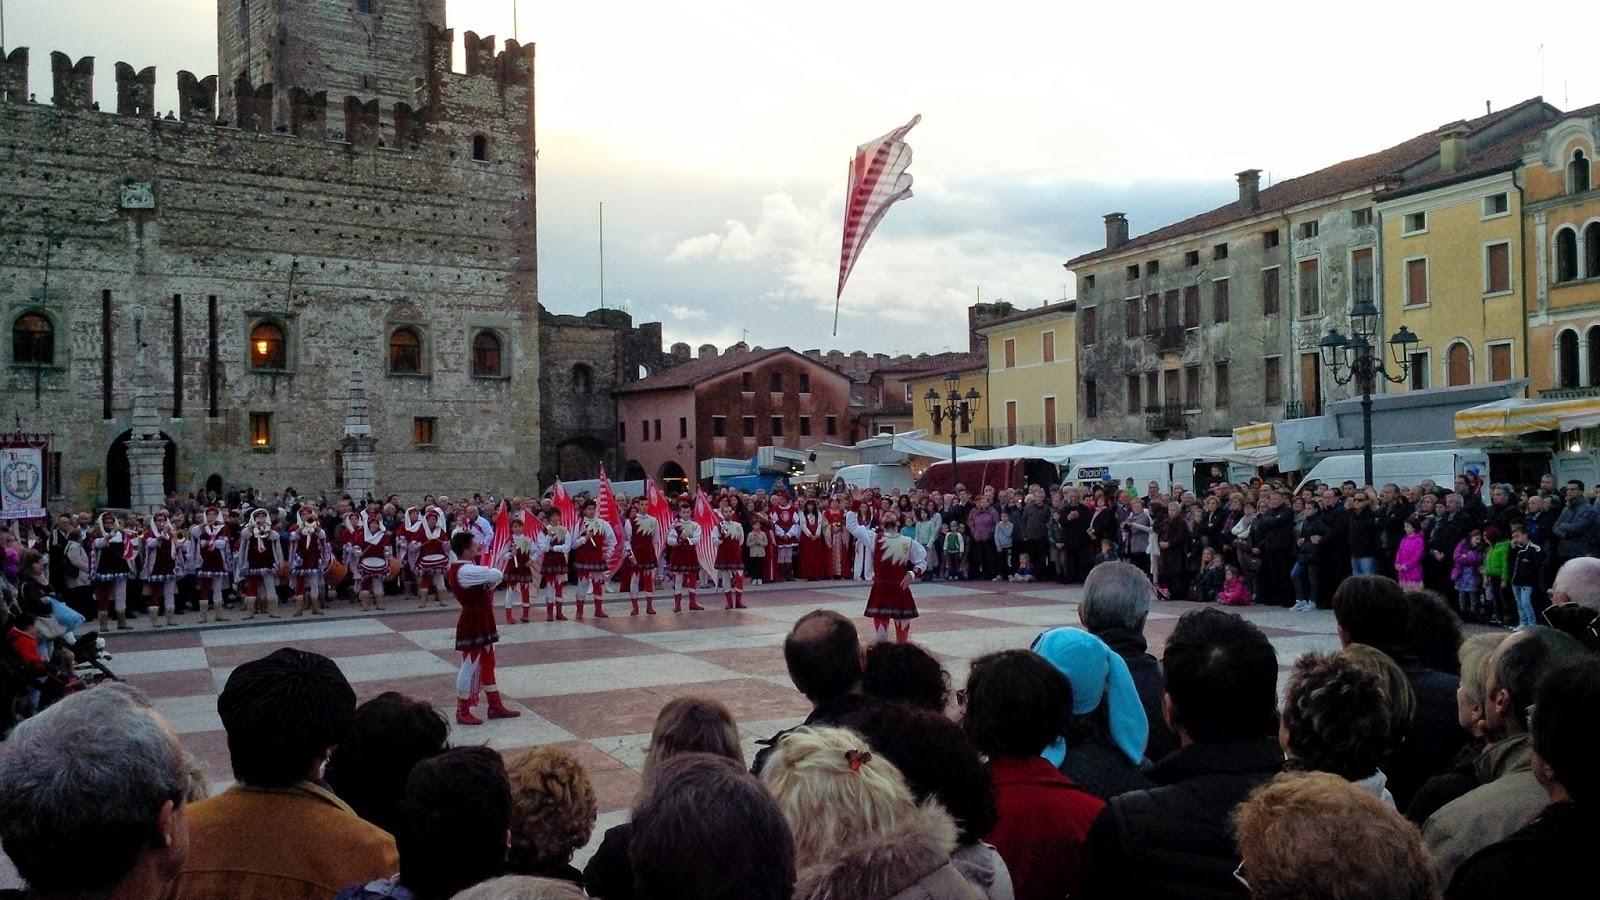 Marostica's main square, Veneto, Italy - www.rossiwrites.com